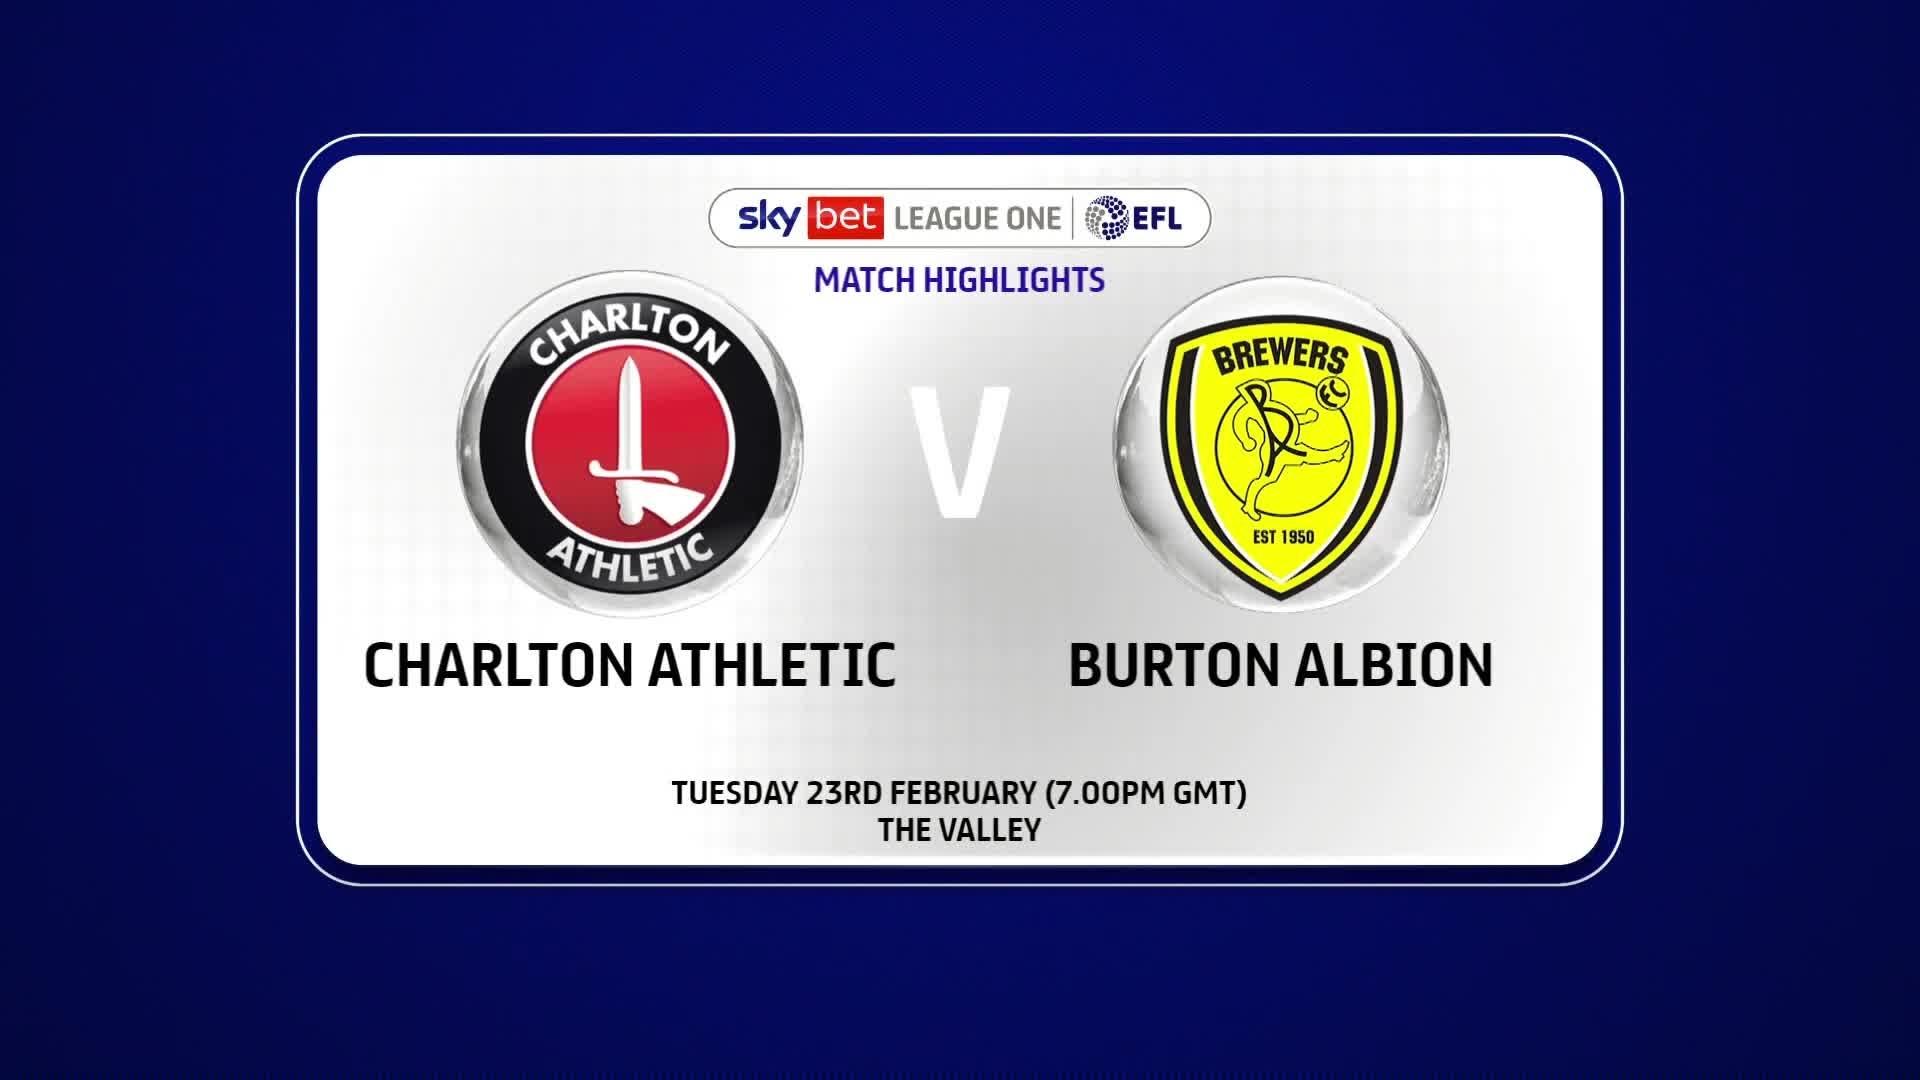 HIGHLIGHTS | Charlton 1 Burton Albion 2 (Feb 2021)